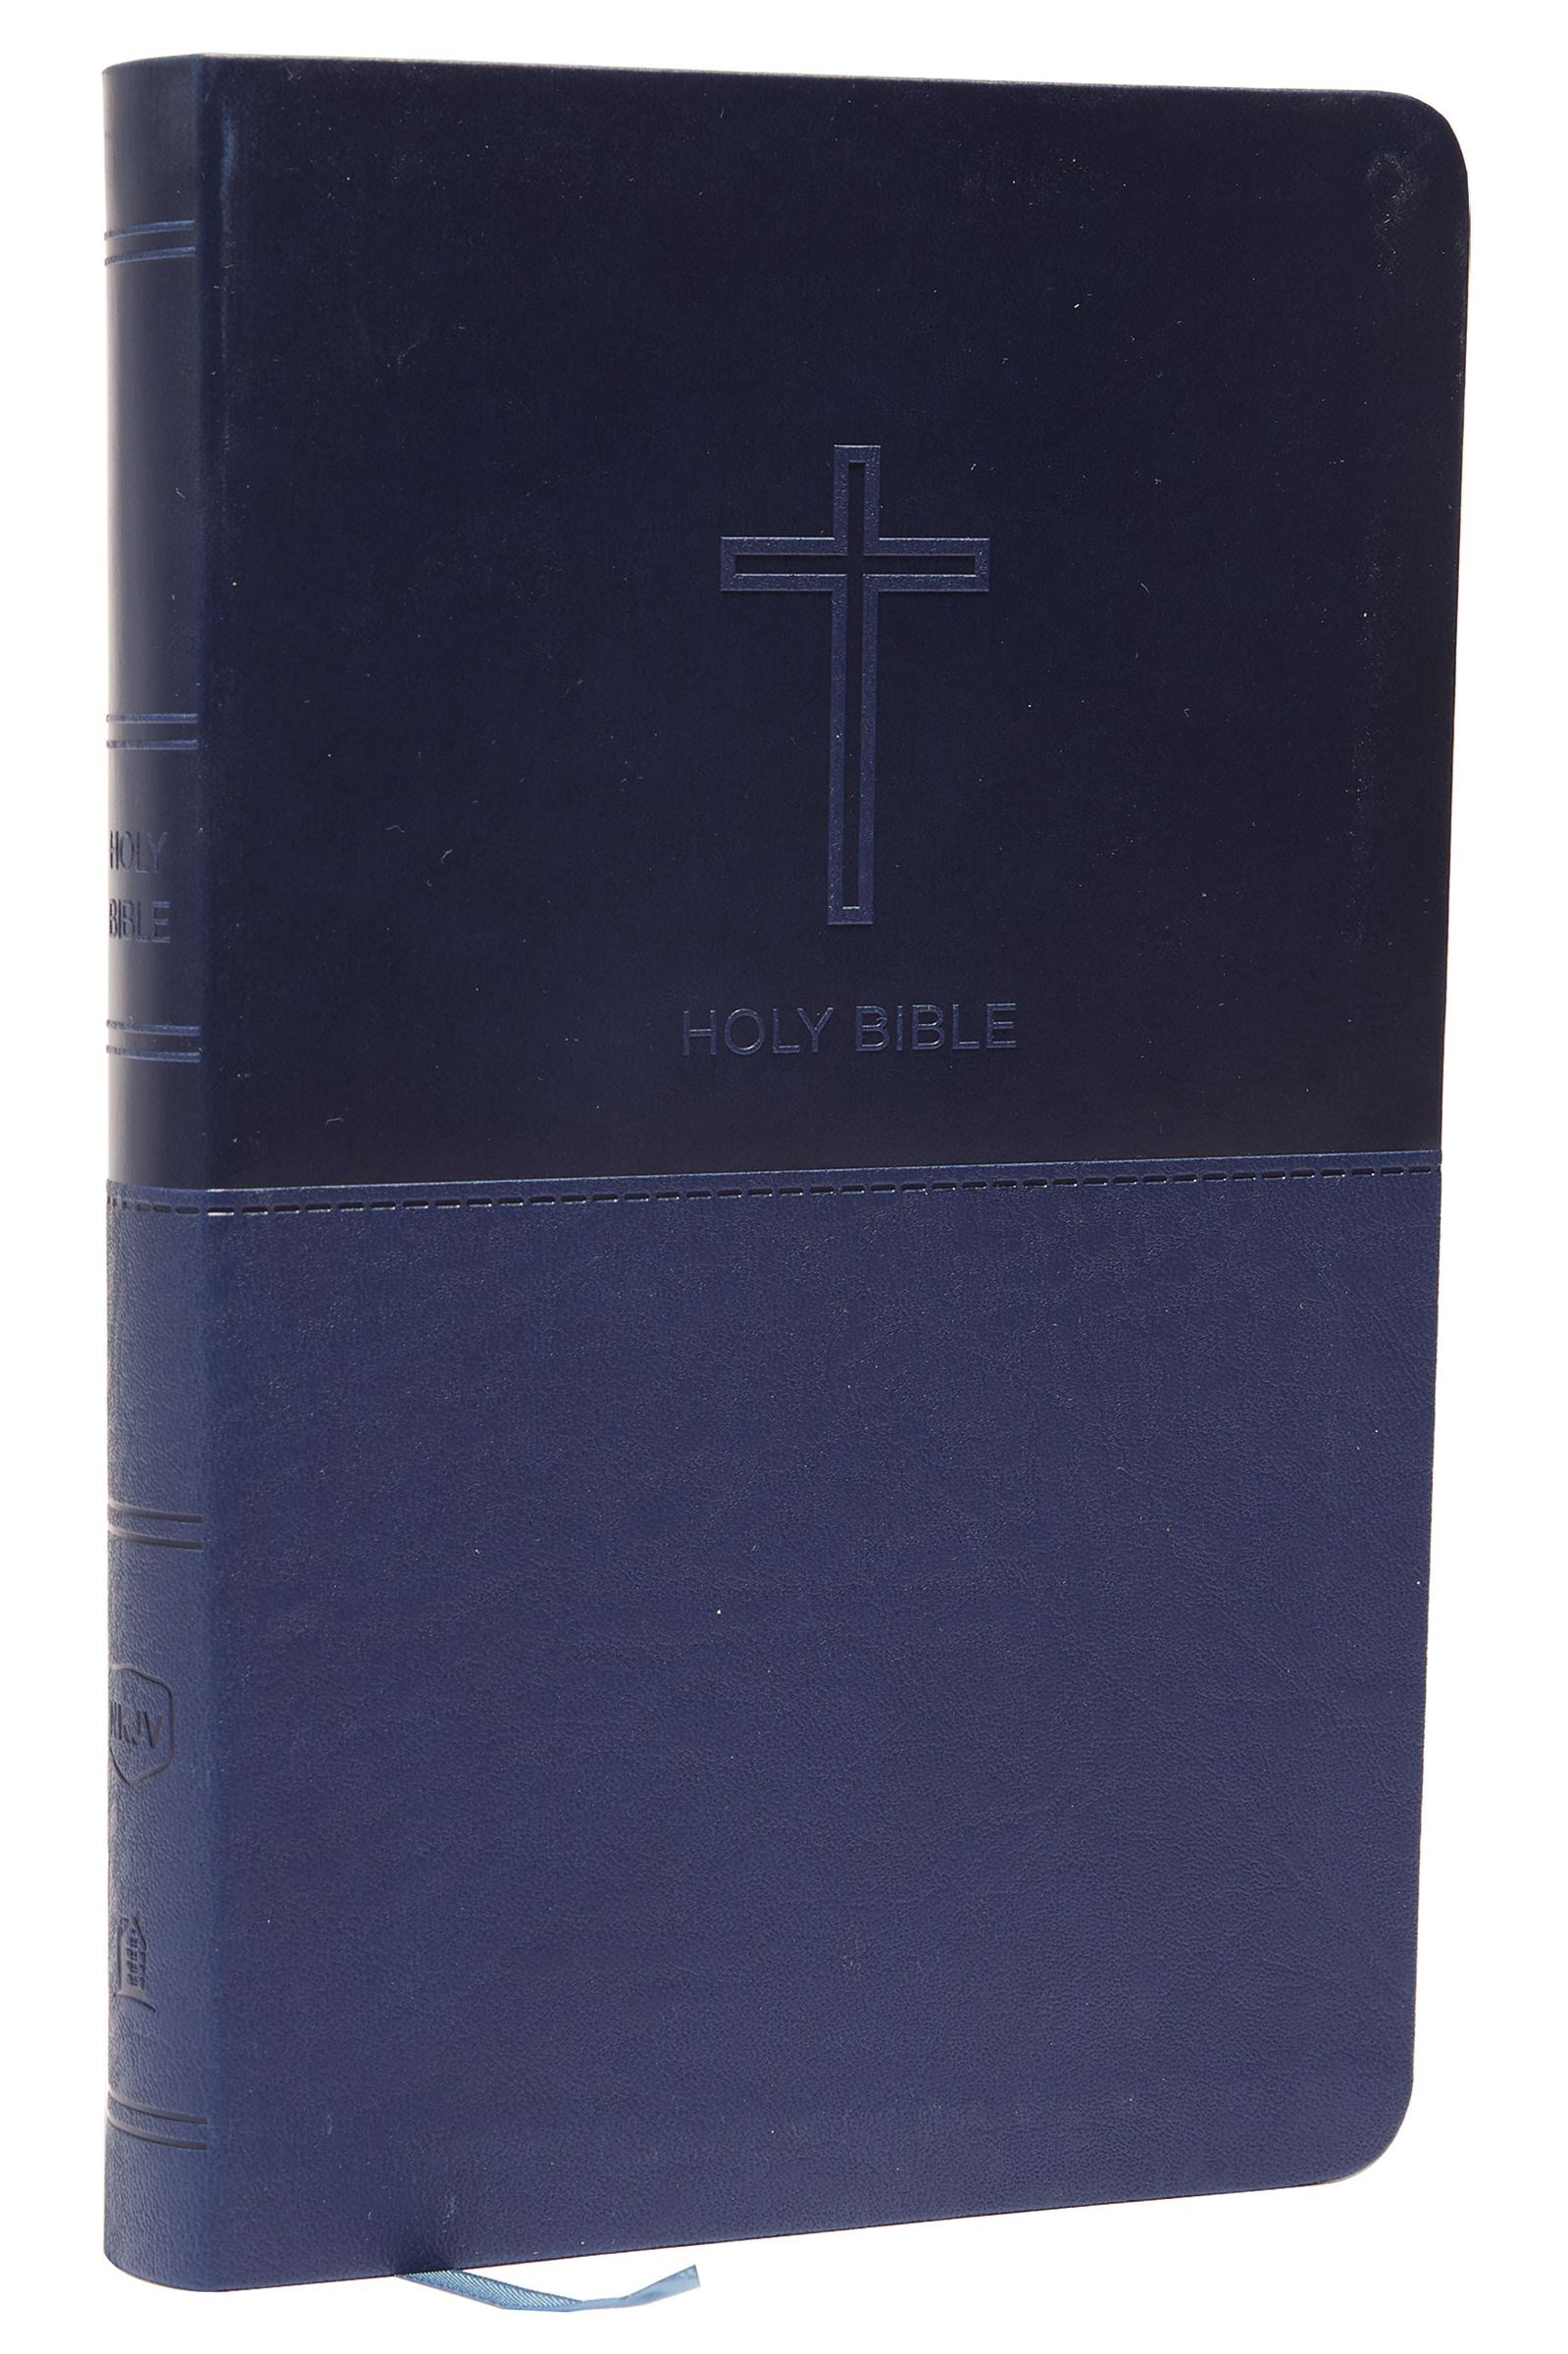 NKJV Thinline Bible (Comfort Print)-Navy Leathersoft